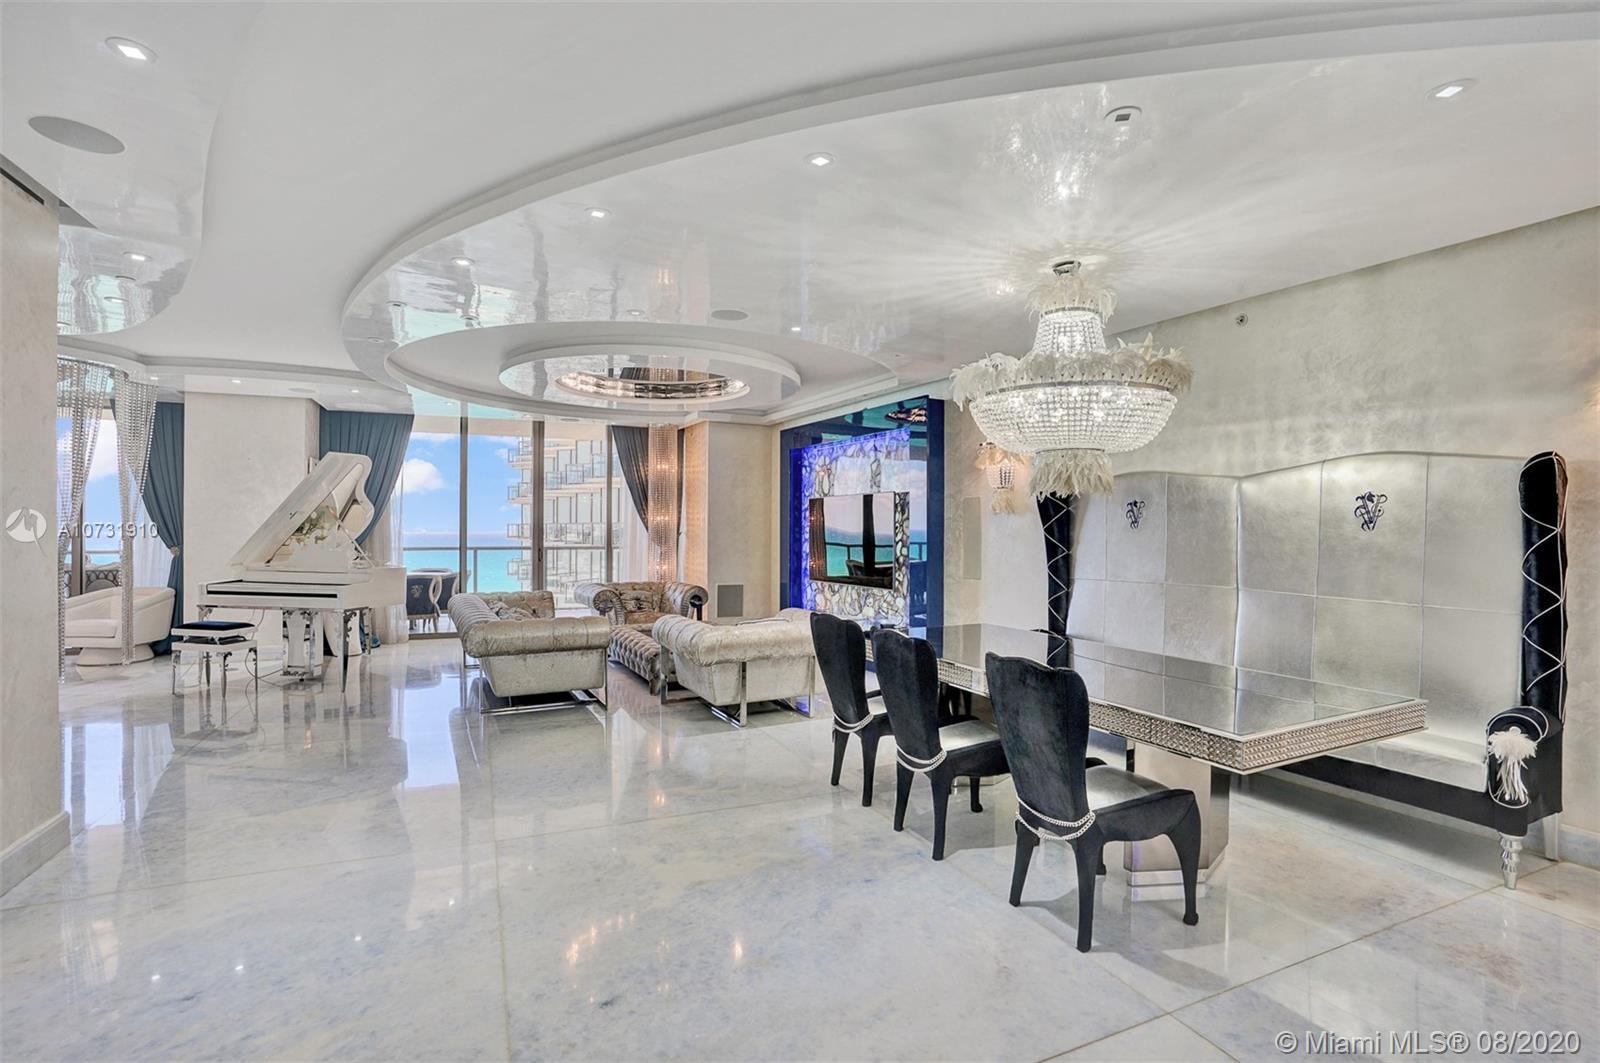 Gorgeous spacious unit with direct ocean and city views, 3 bdr + DEN/3.5bth in St Regis, Bal Harbour